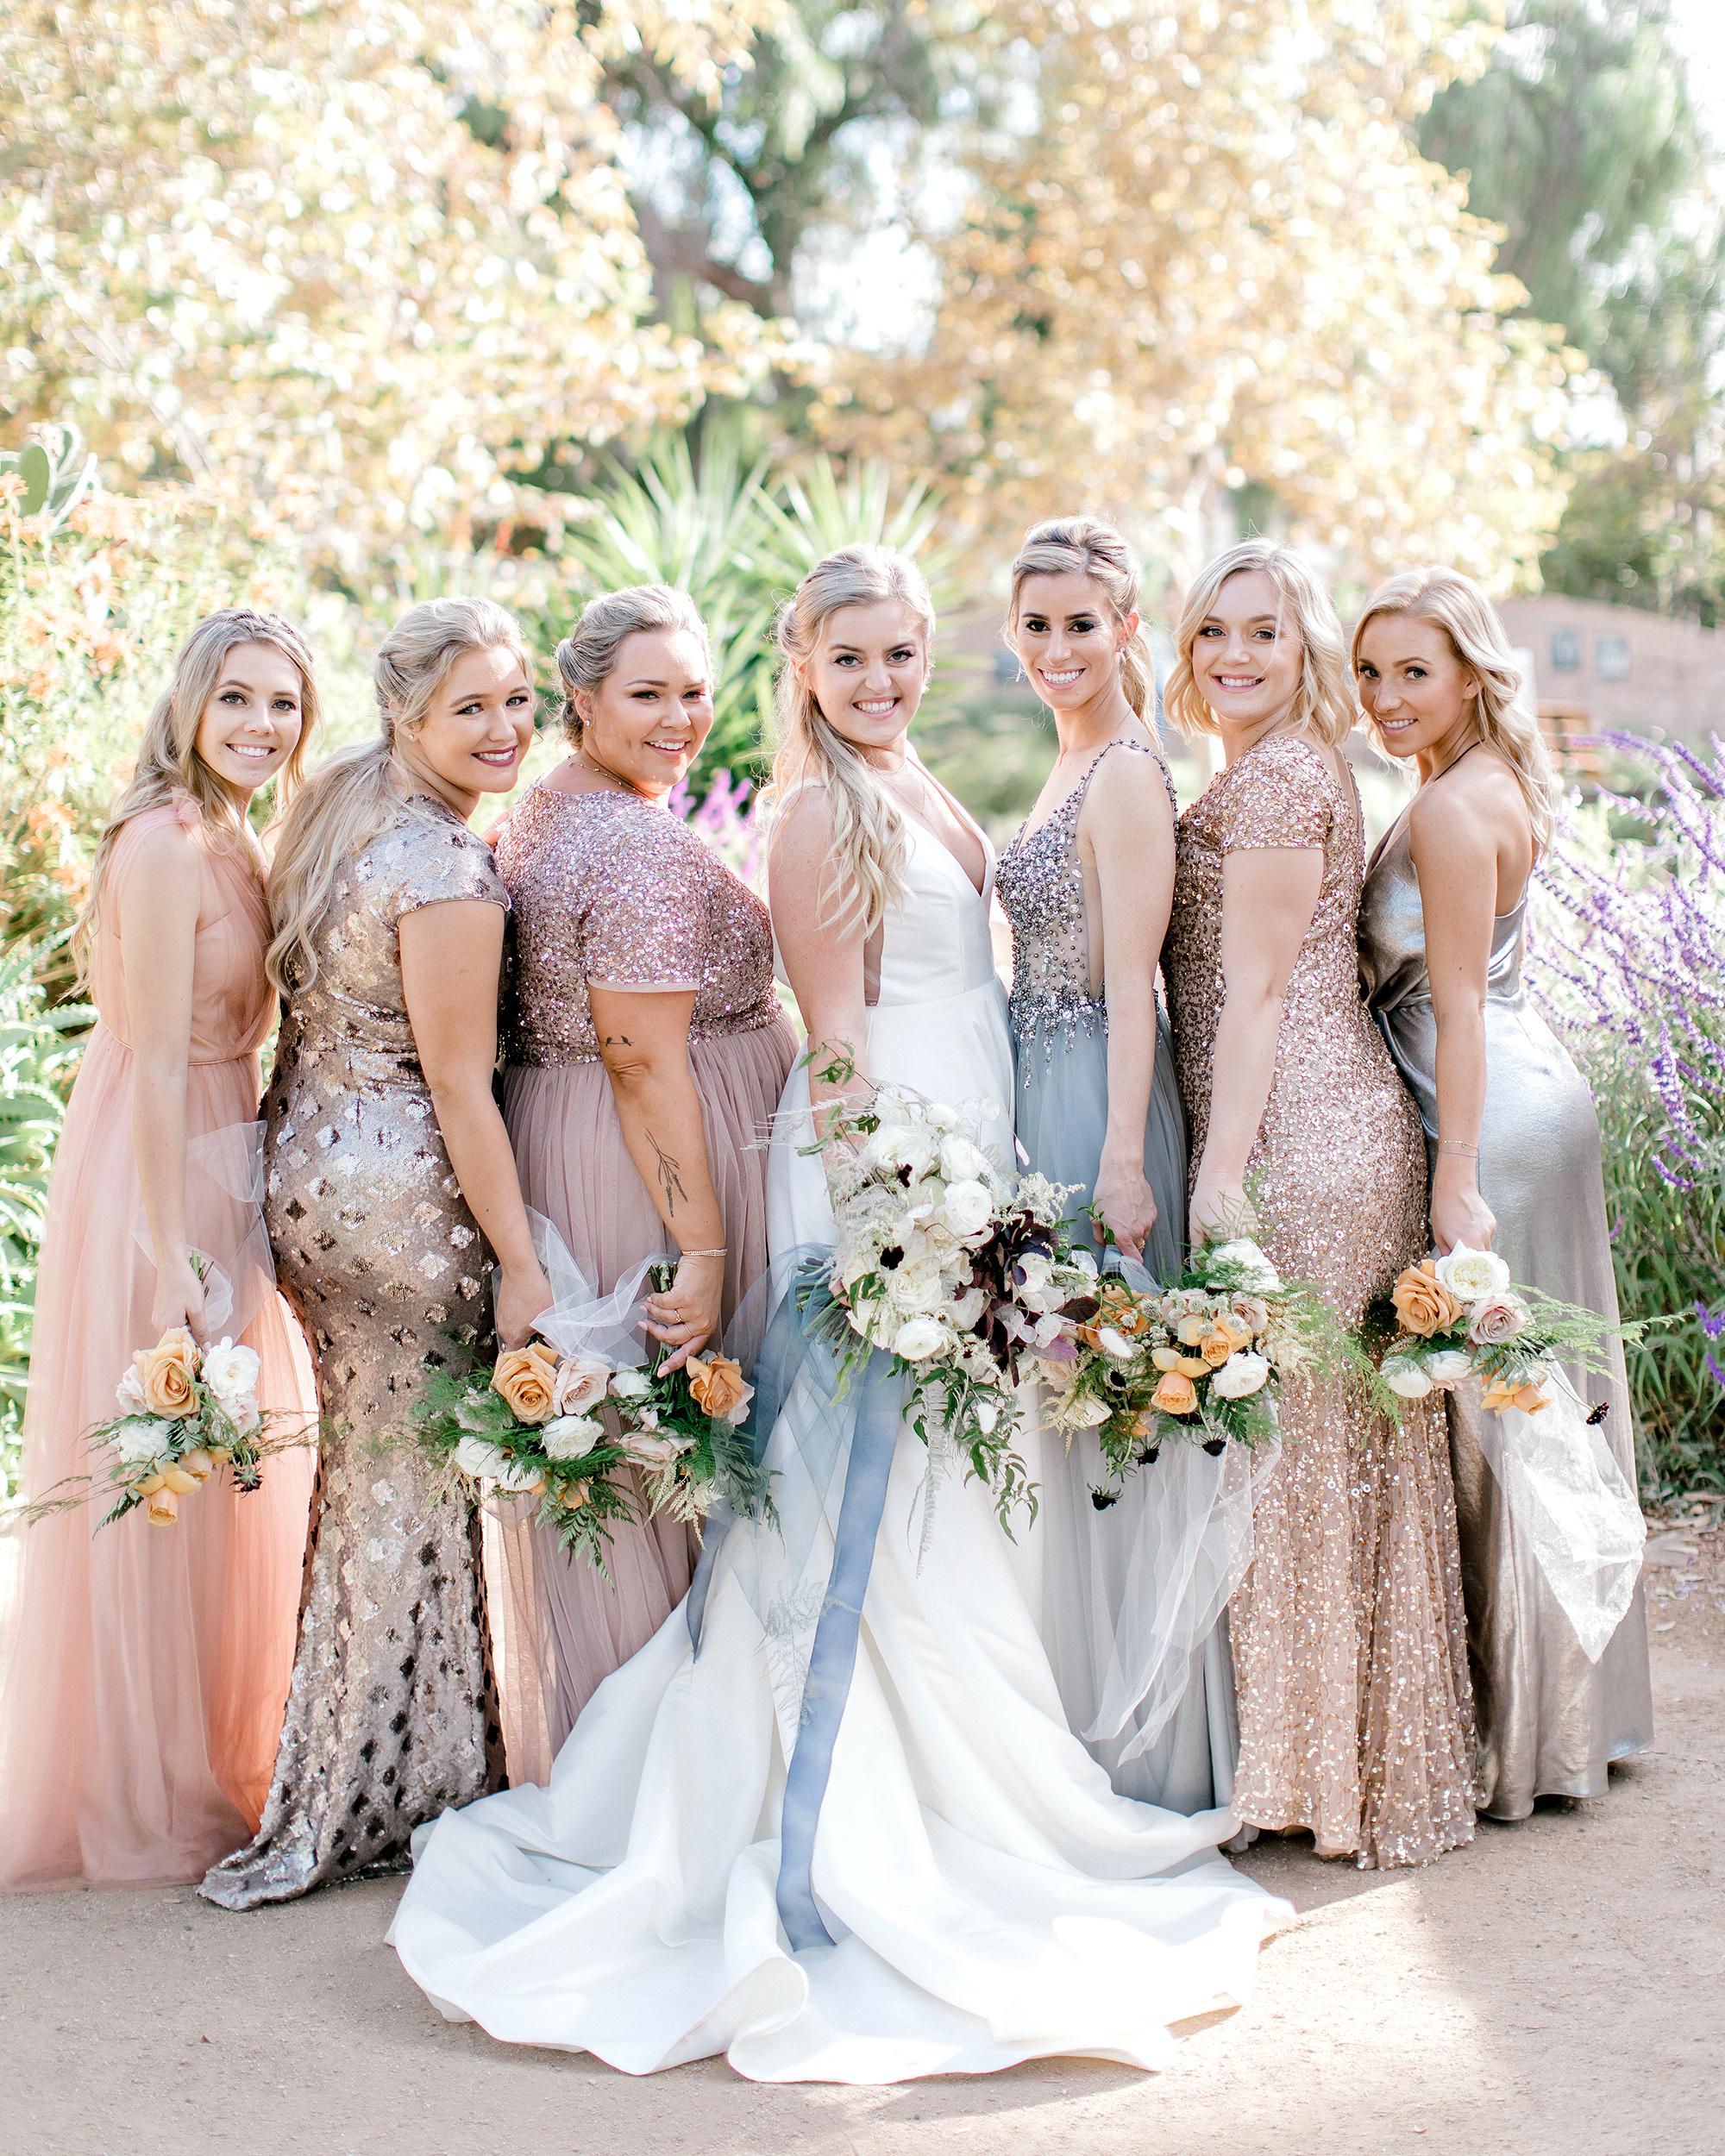 metallic wedding bridesmaids dresses with bride